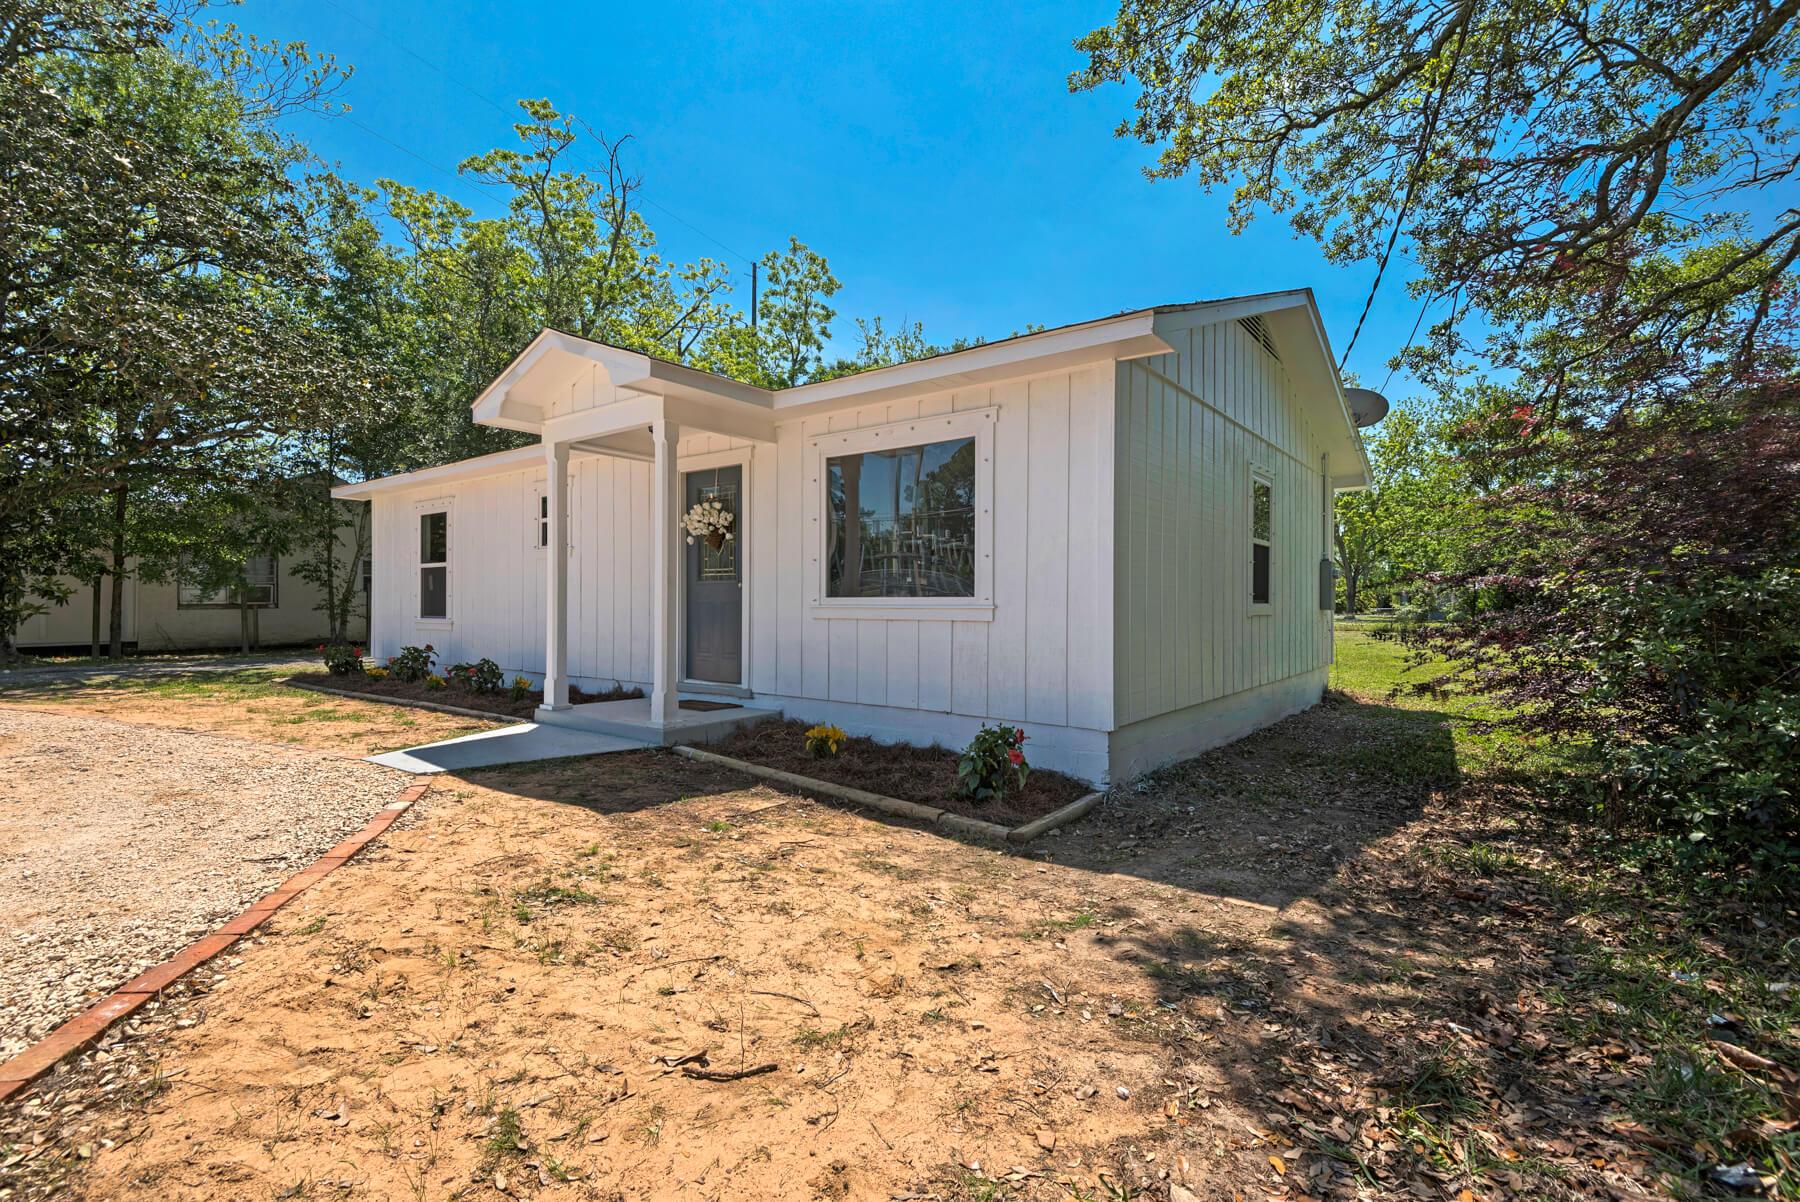 7466 Twin Beech Road Fairhope for Sale Urban Property Outside view 4